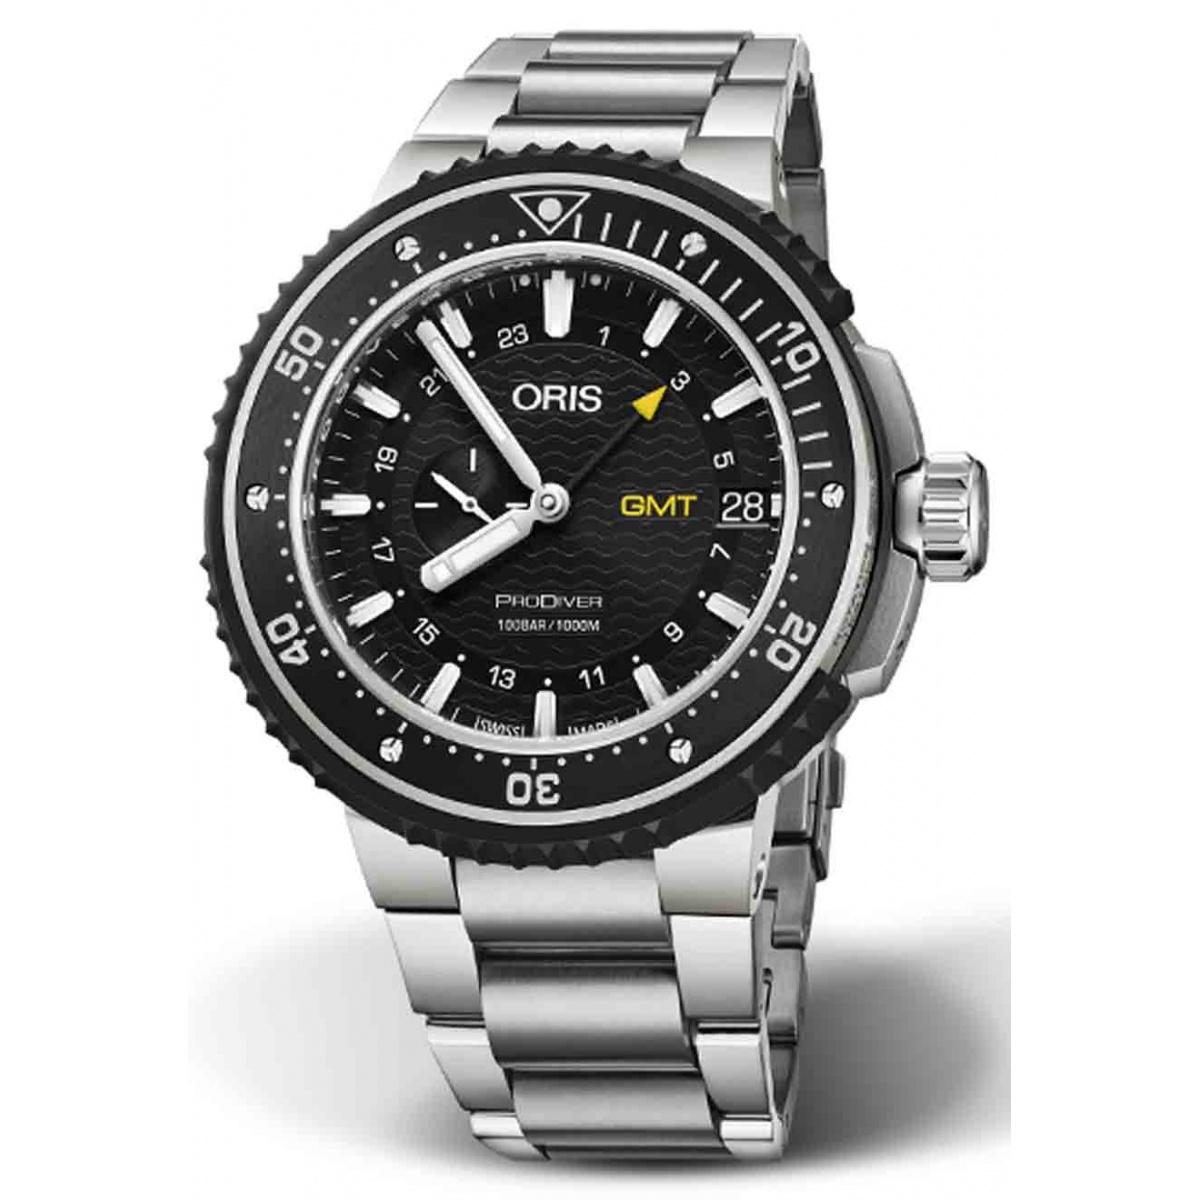 ORIS PRODIVER GMT 100 M ∅49 mm, Esfera negra, brazalete de acero